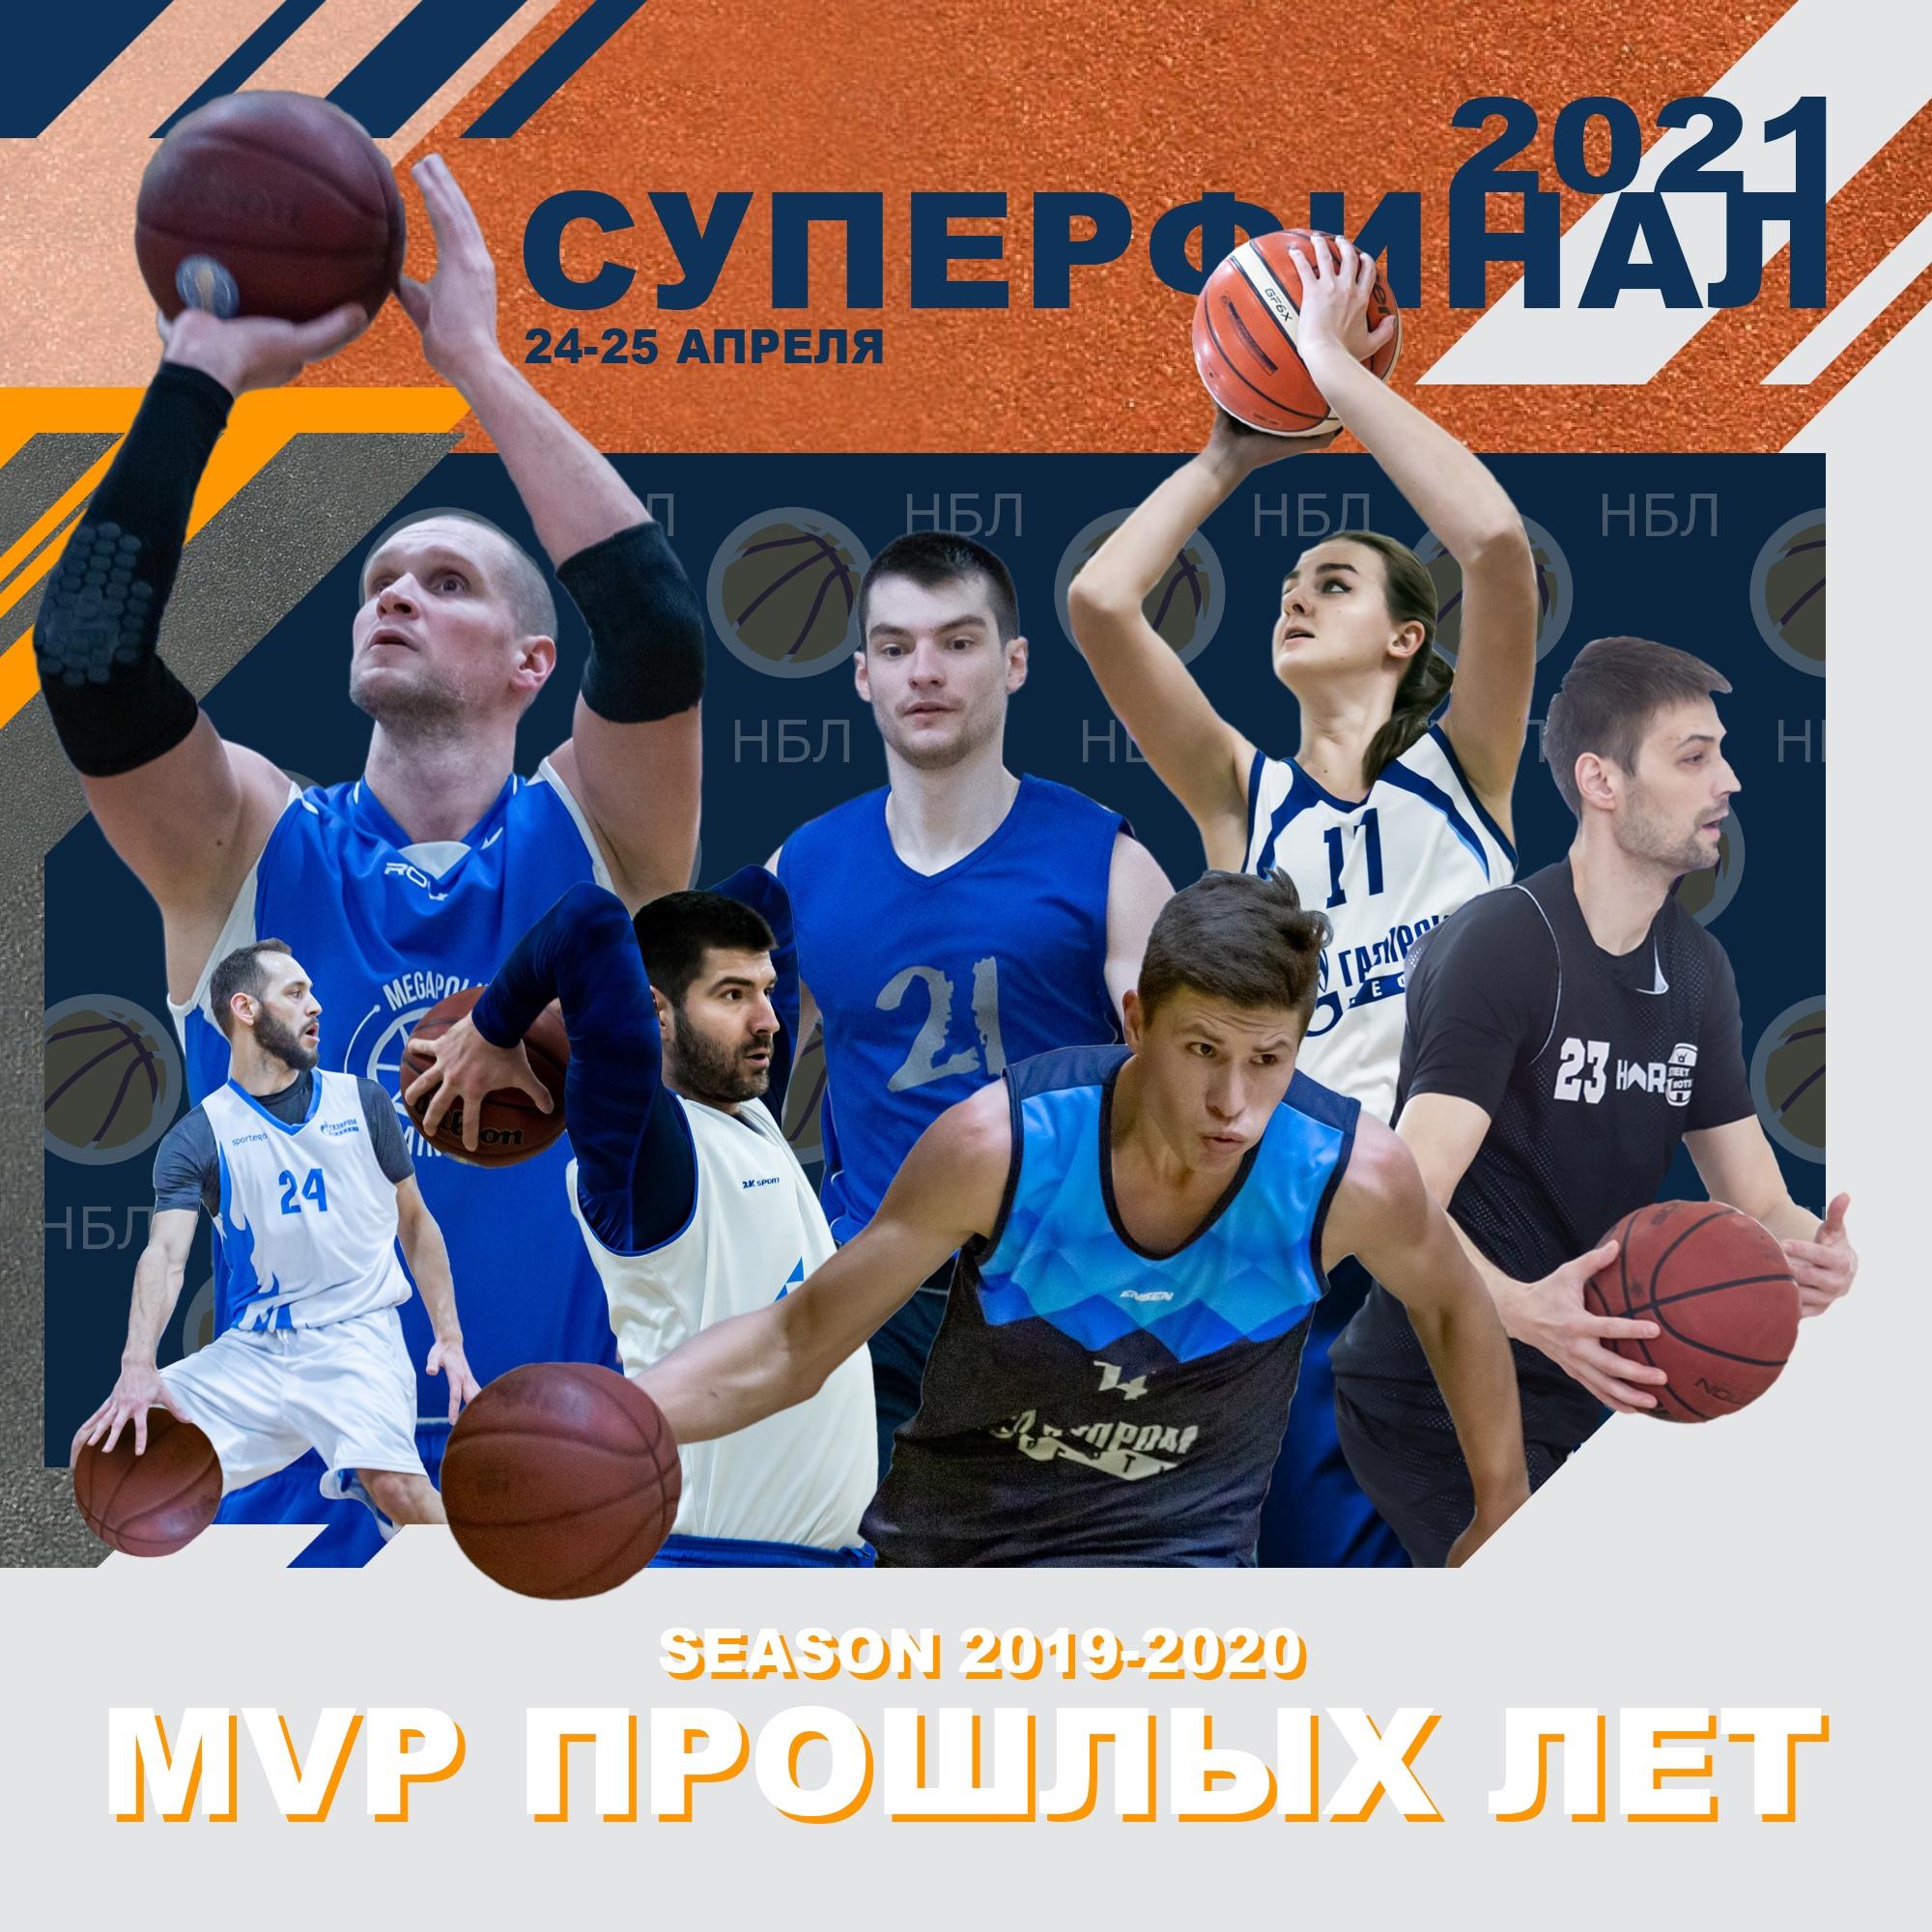 MVP сезона 2019-2020